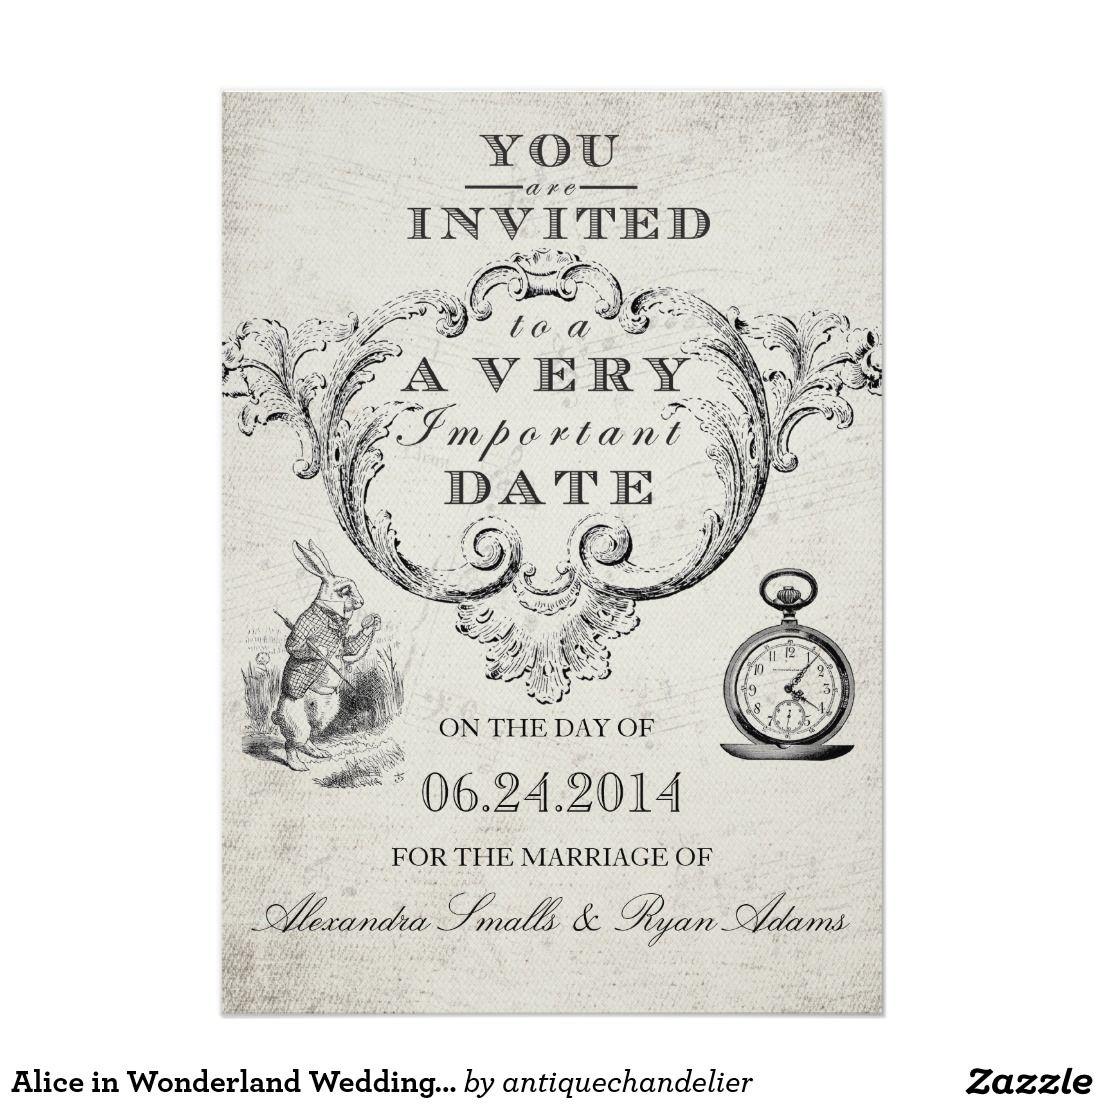 Alice in Wonderland Wedding Invitation | Weddings, Wedding and ...